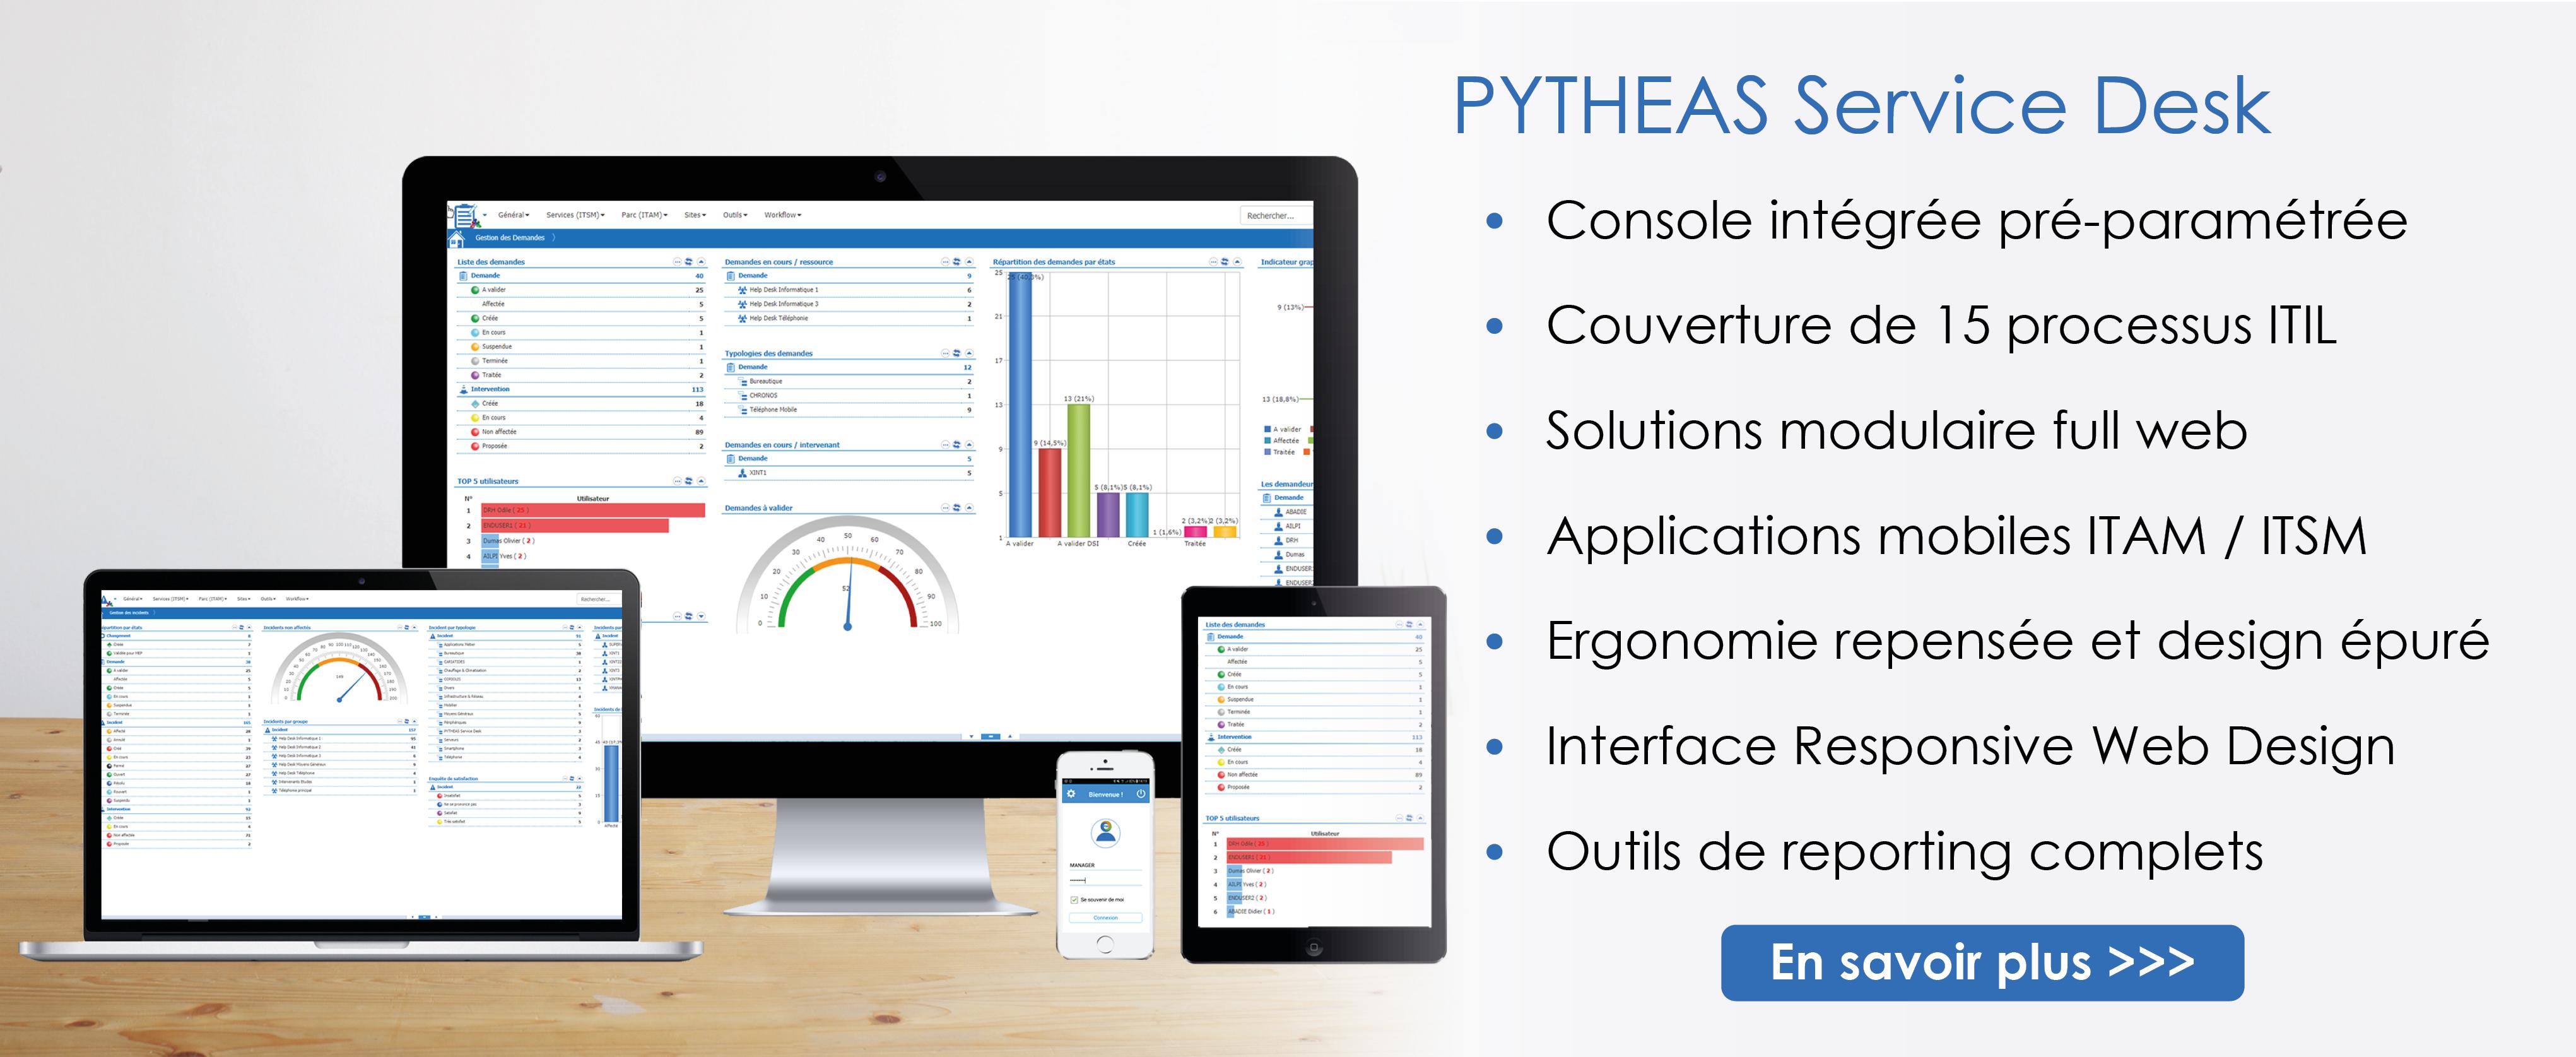 PYTHEAS Service Desk